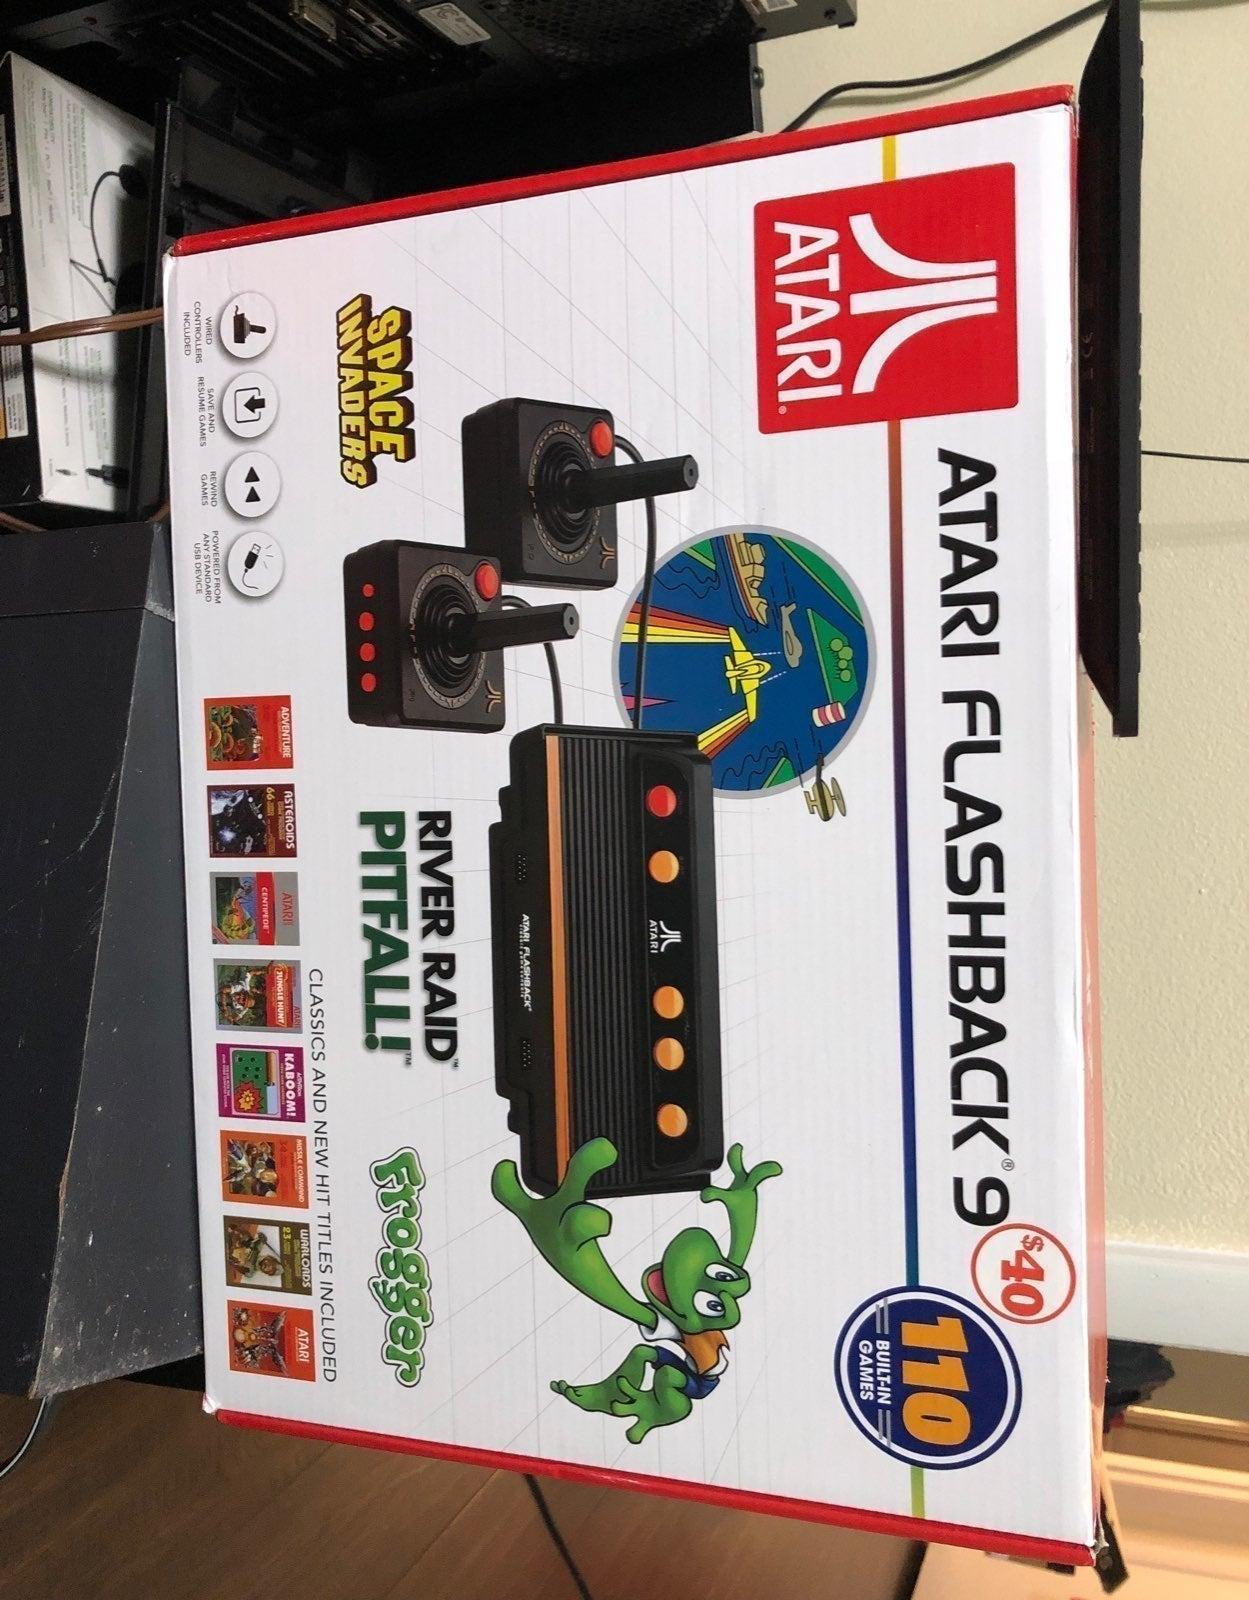 Atari Flashback Vintage game console